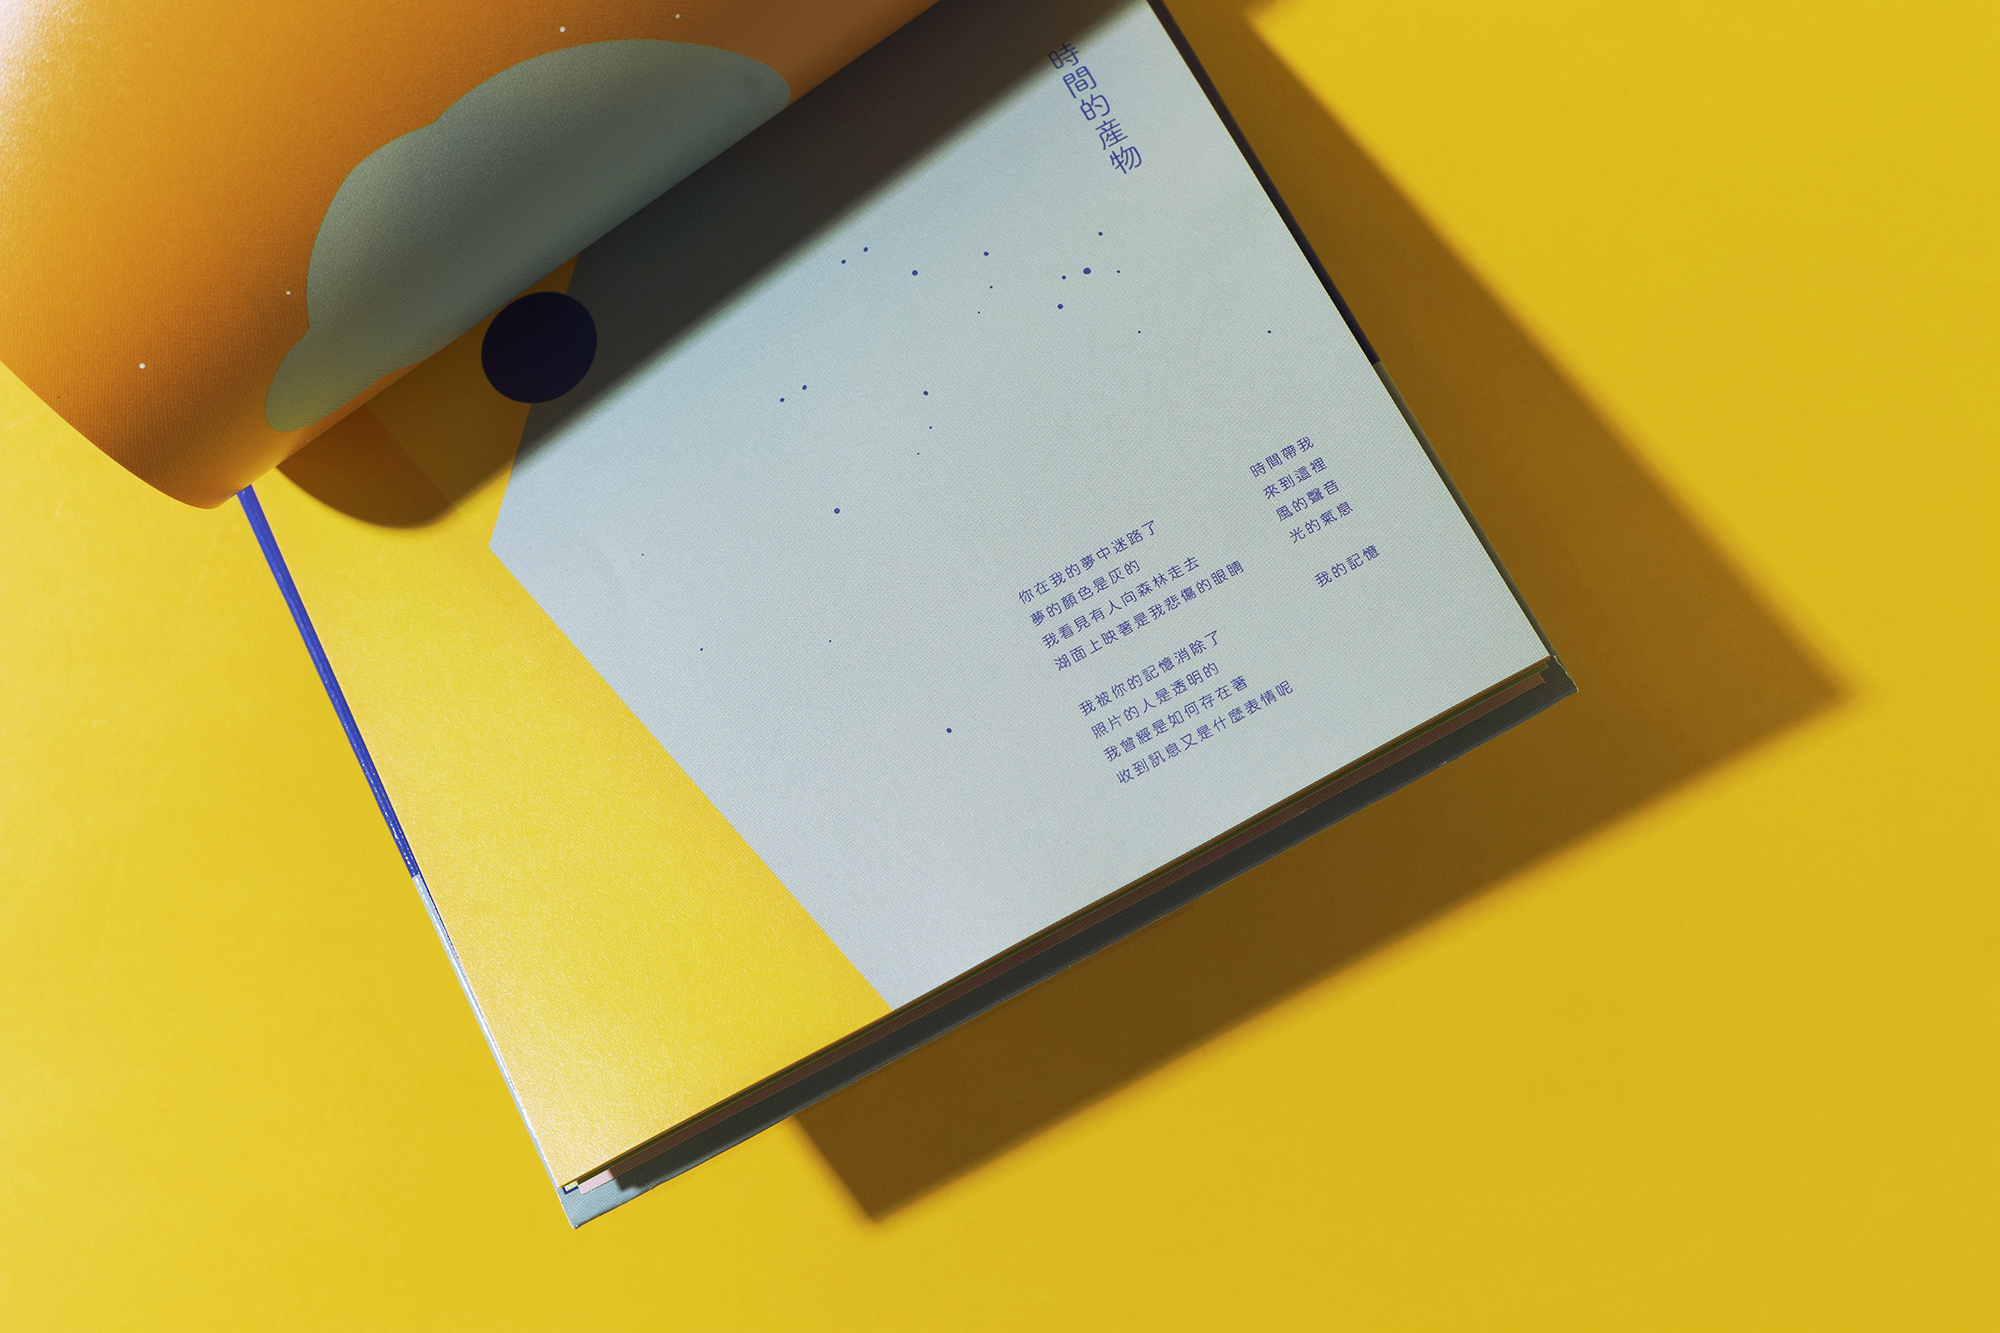 _DSC7360-1 copy